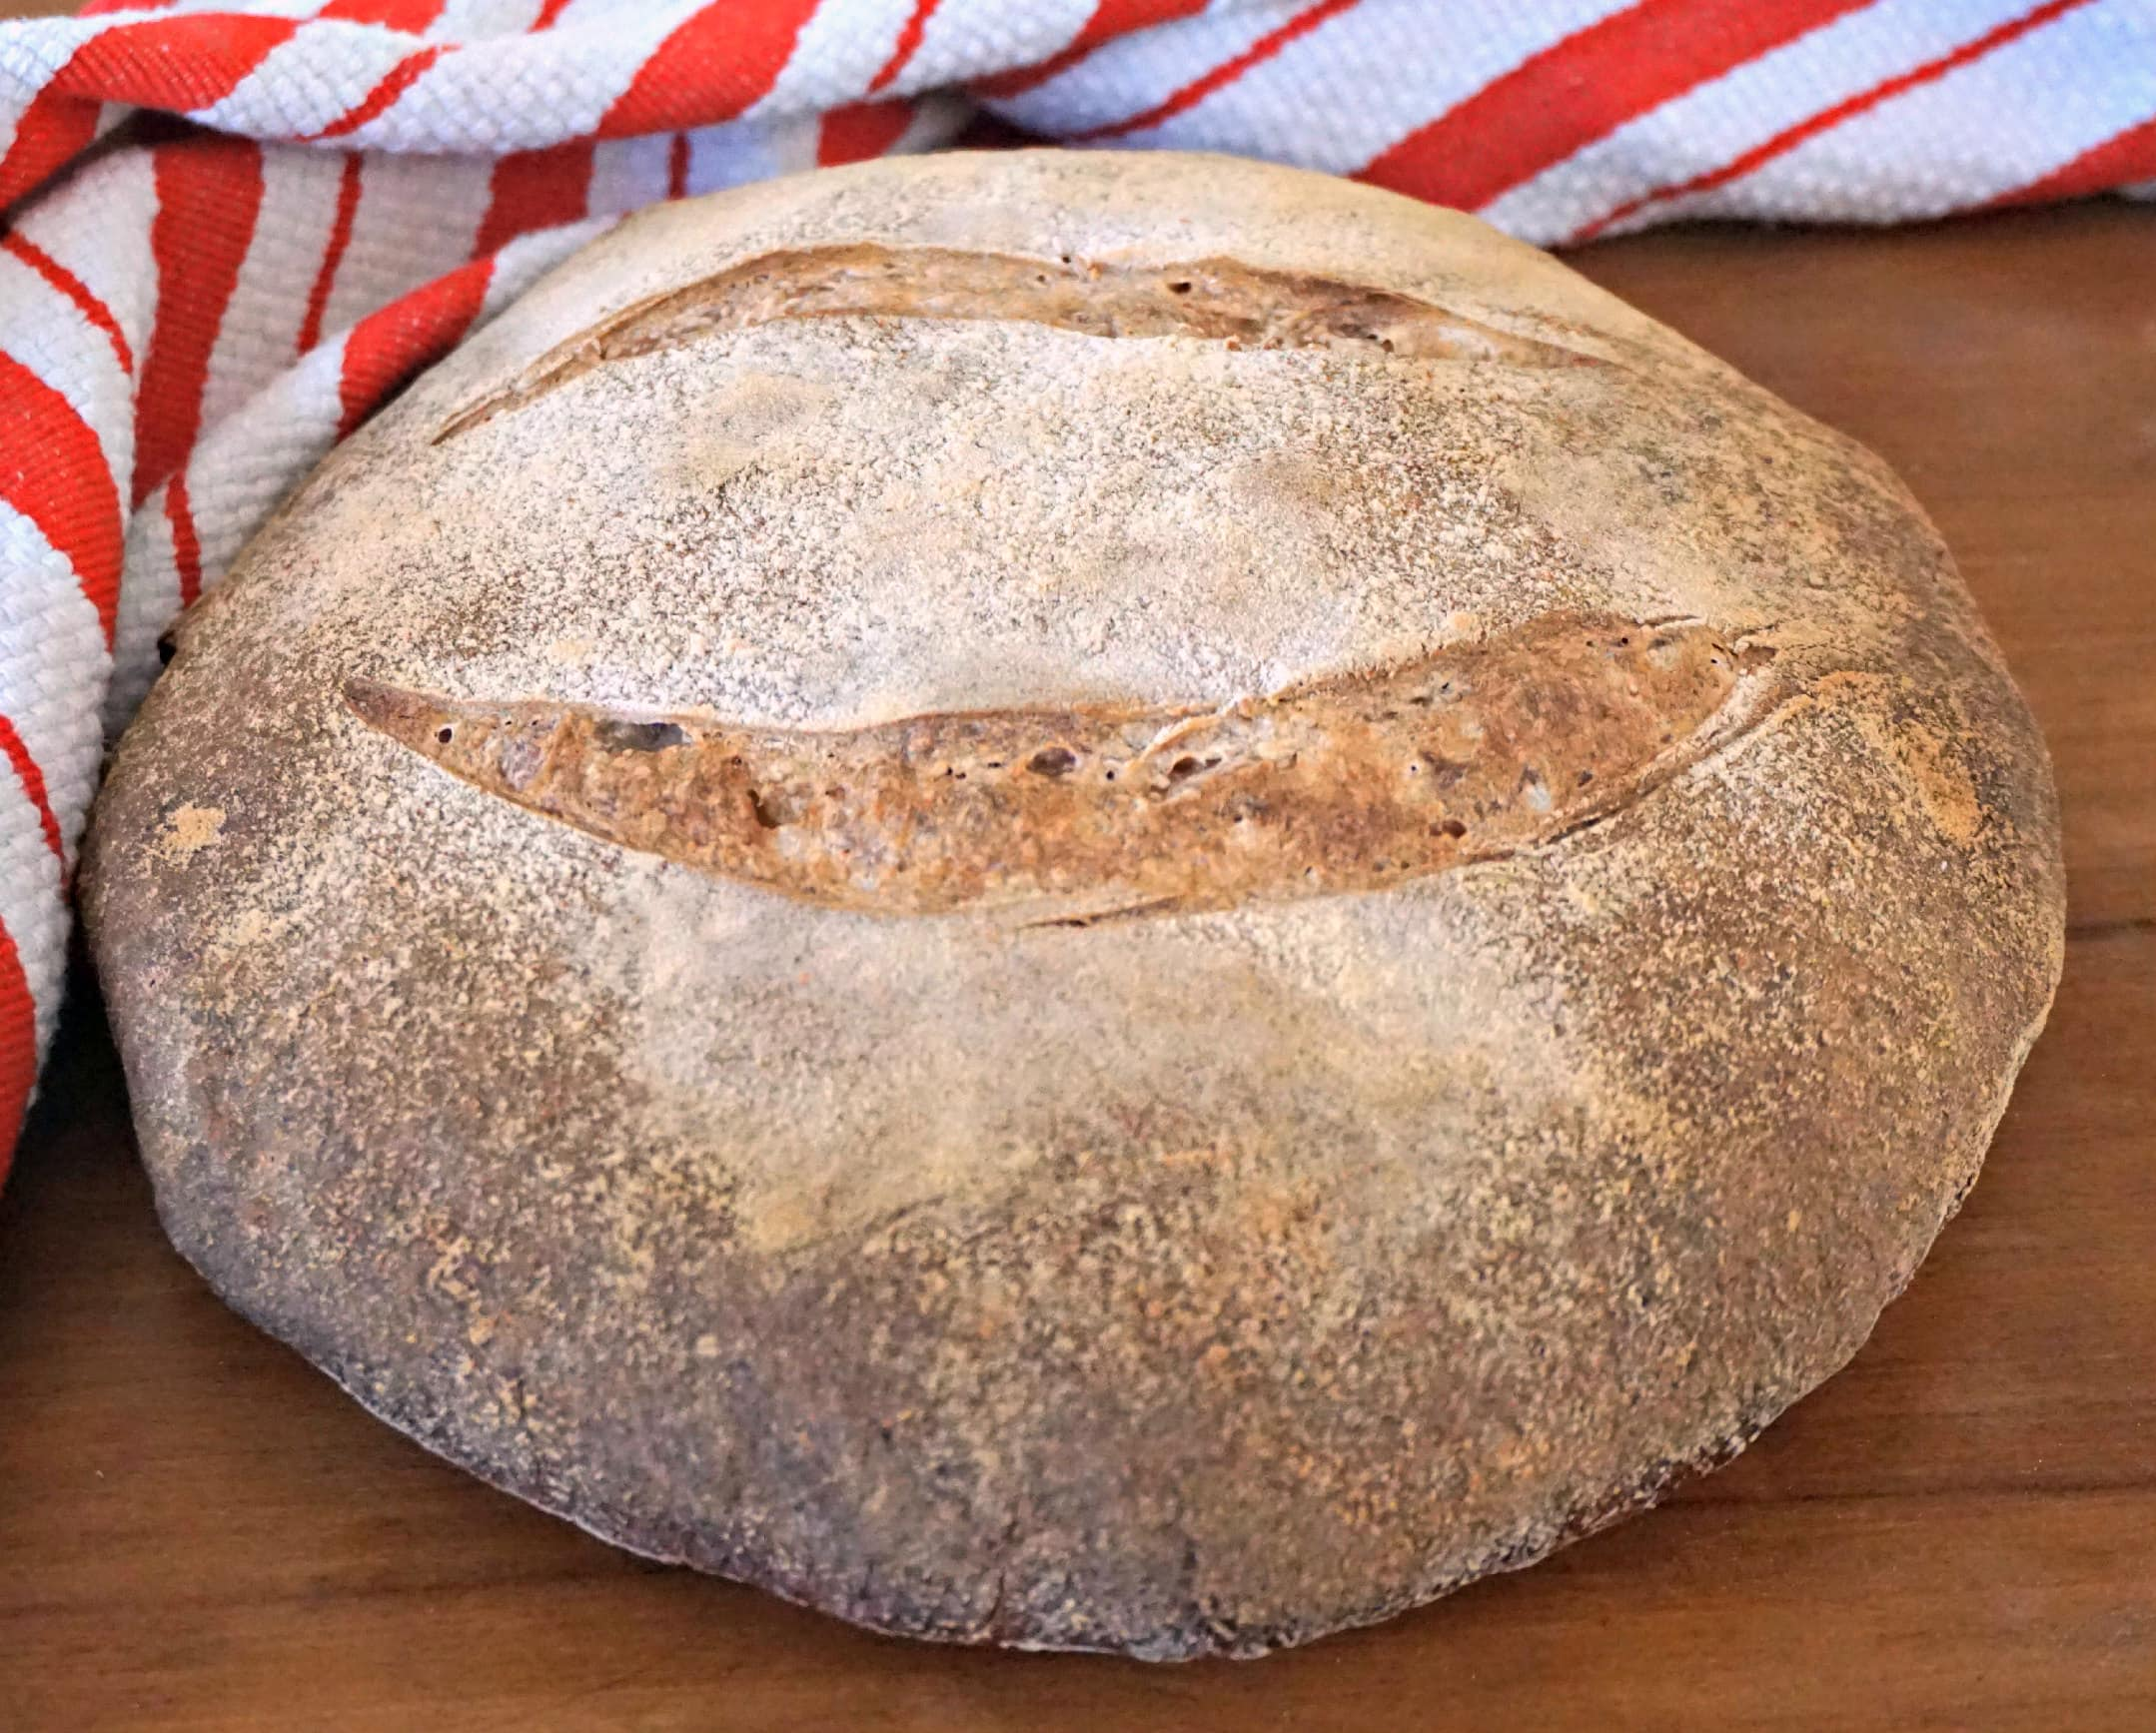 Smiling Sourdough Bread